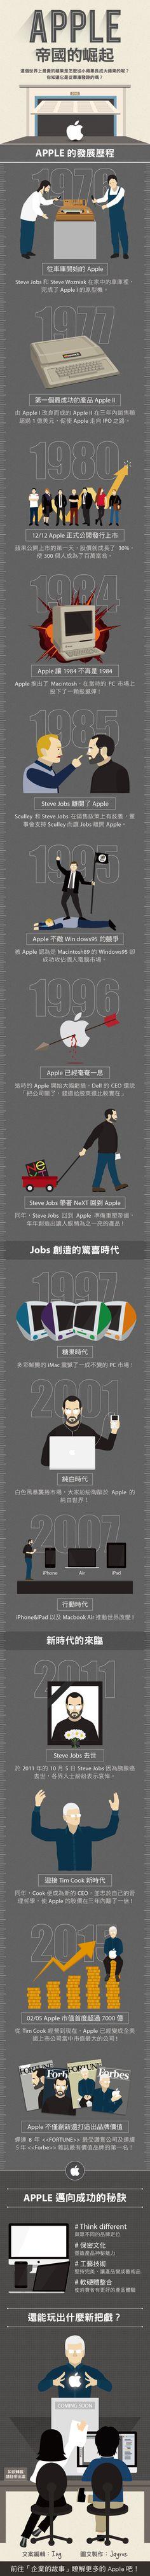 Apple 帝國的崛起 #Apple #business #management